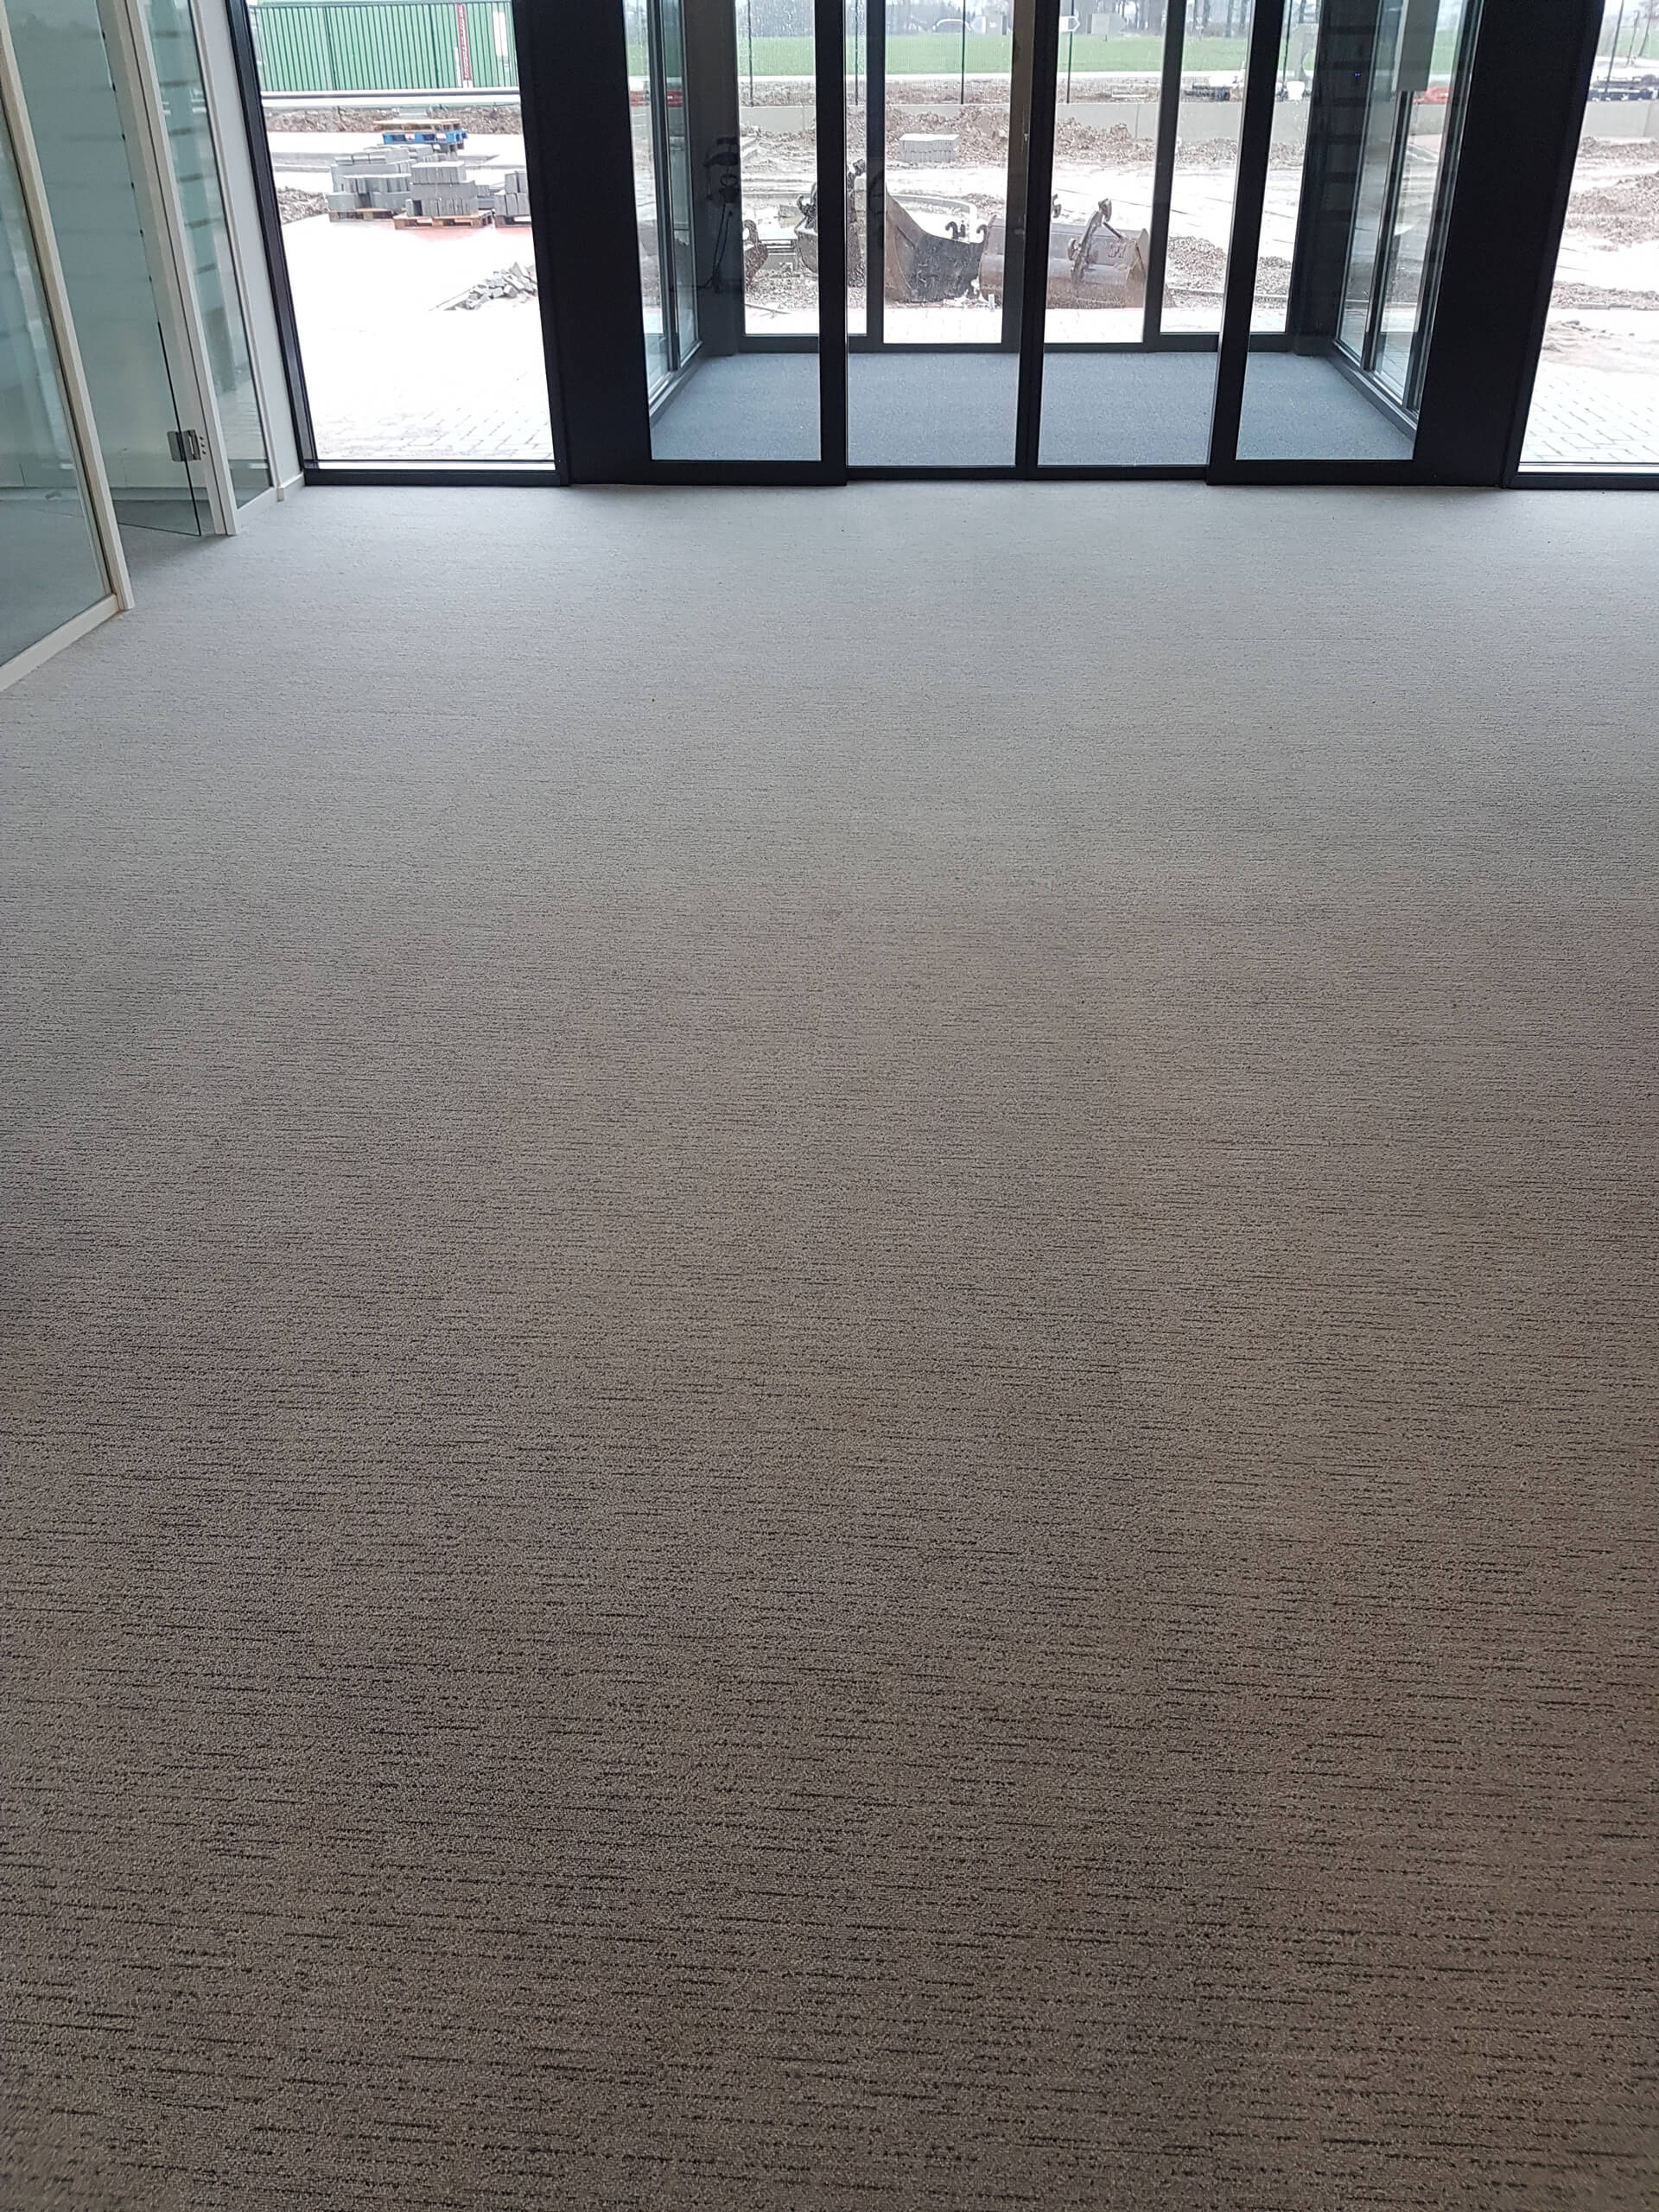 grindvloer onderhoud en reiniging